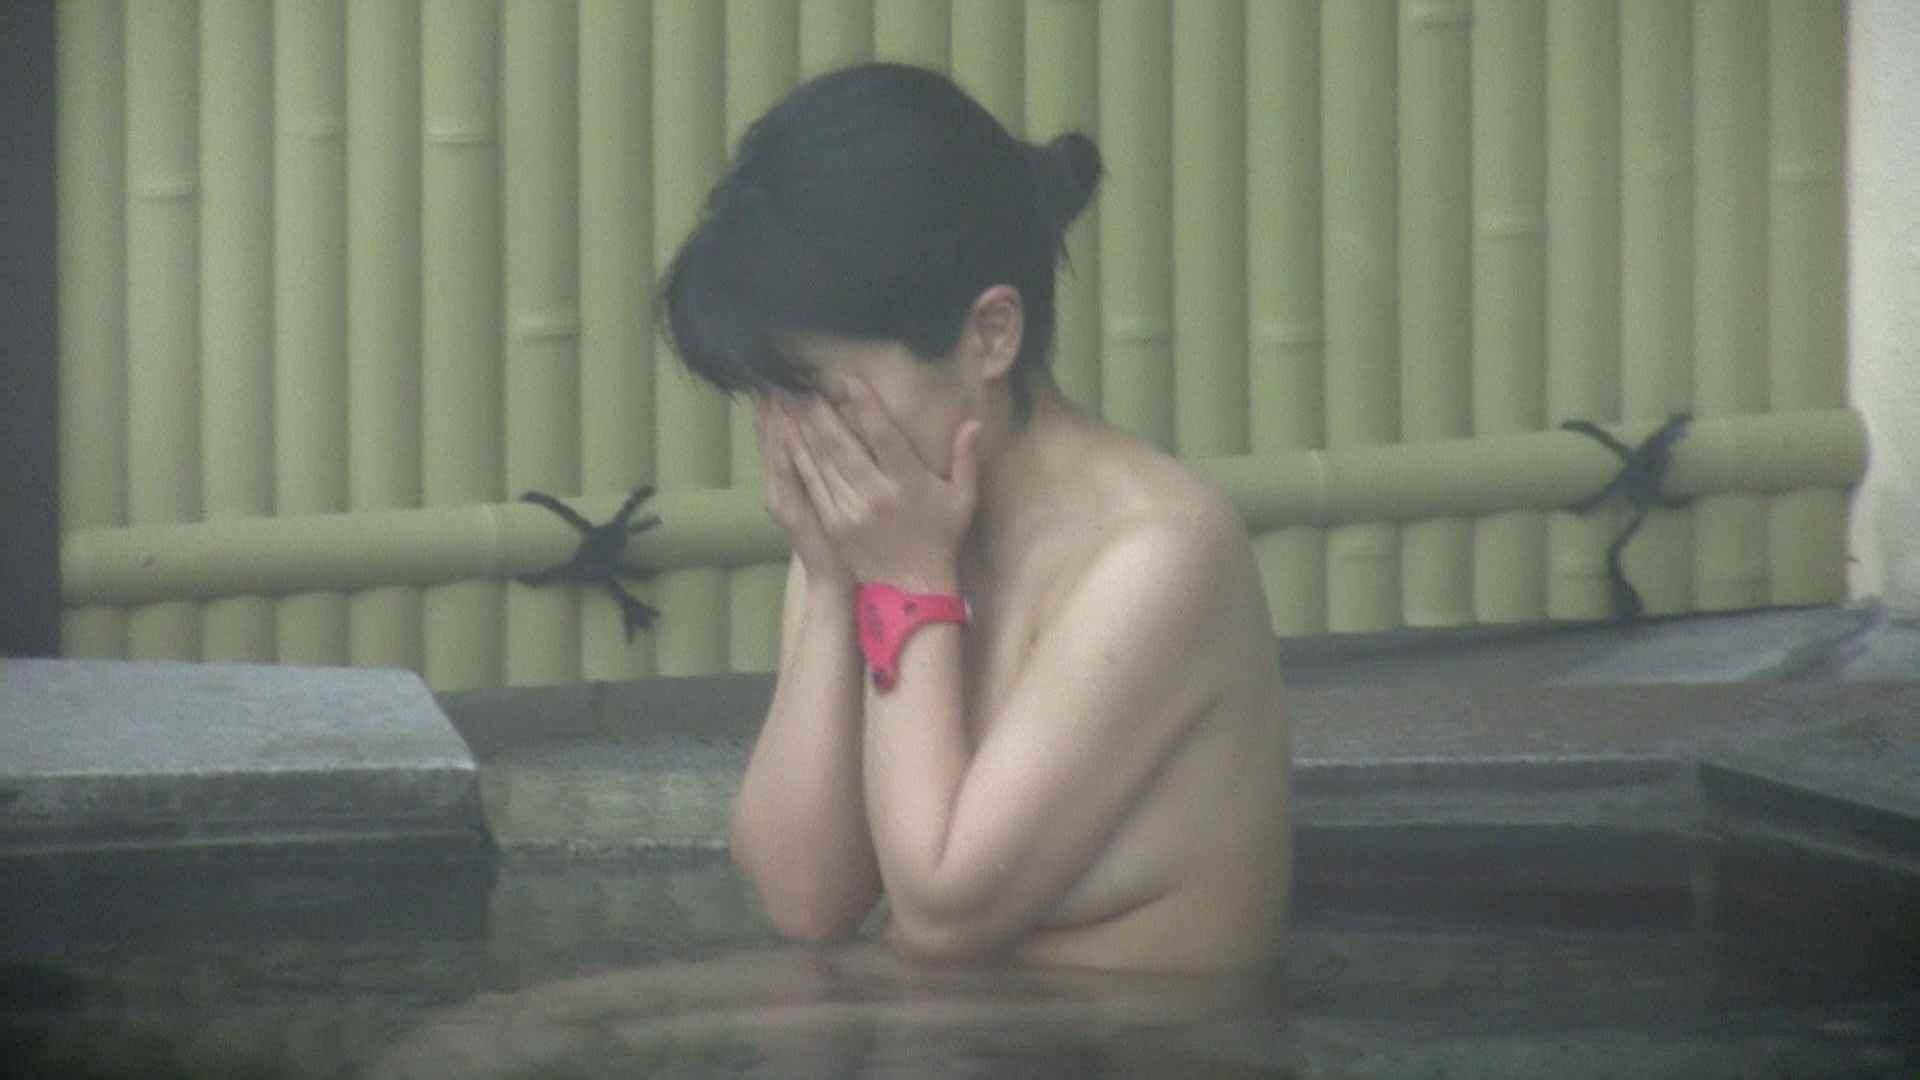 Aquaな露天風呂Vol.585 露天 アダルト動画キャプチャ 78PICs 38